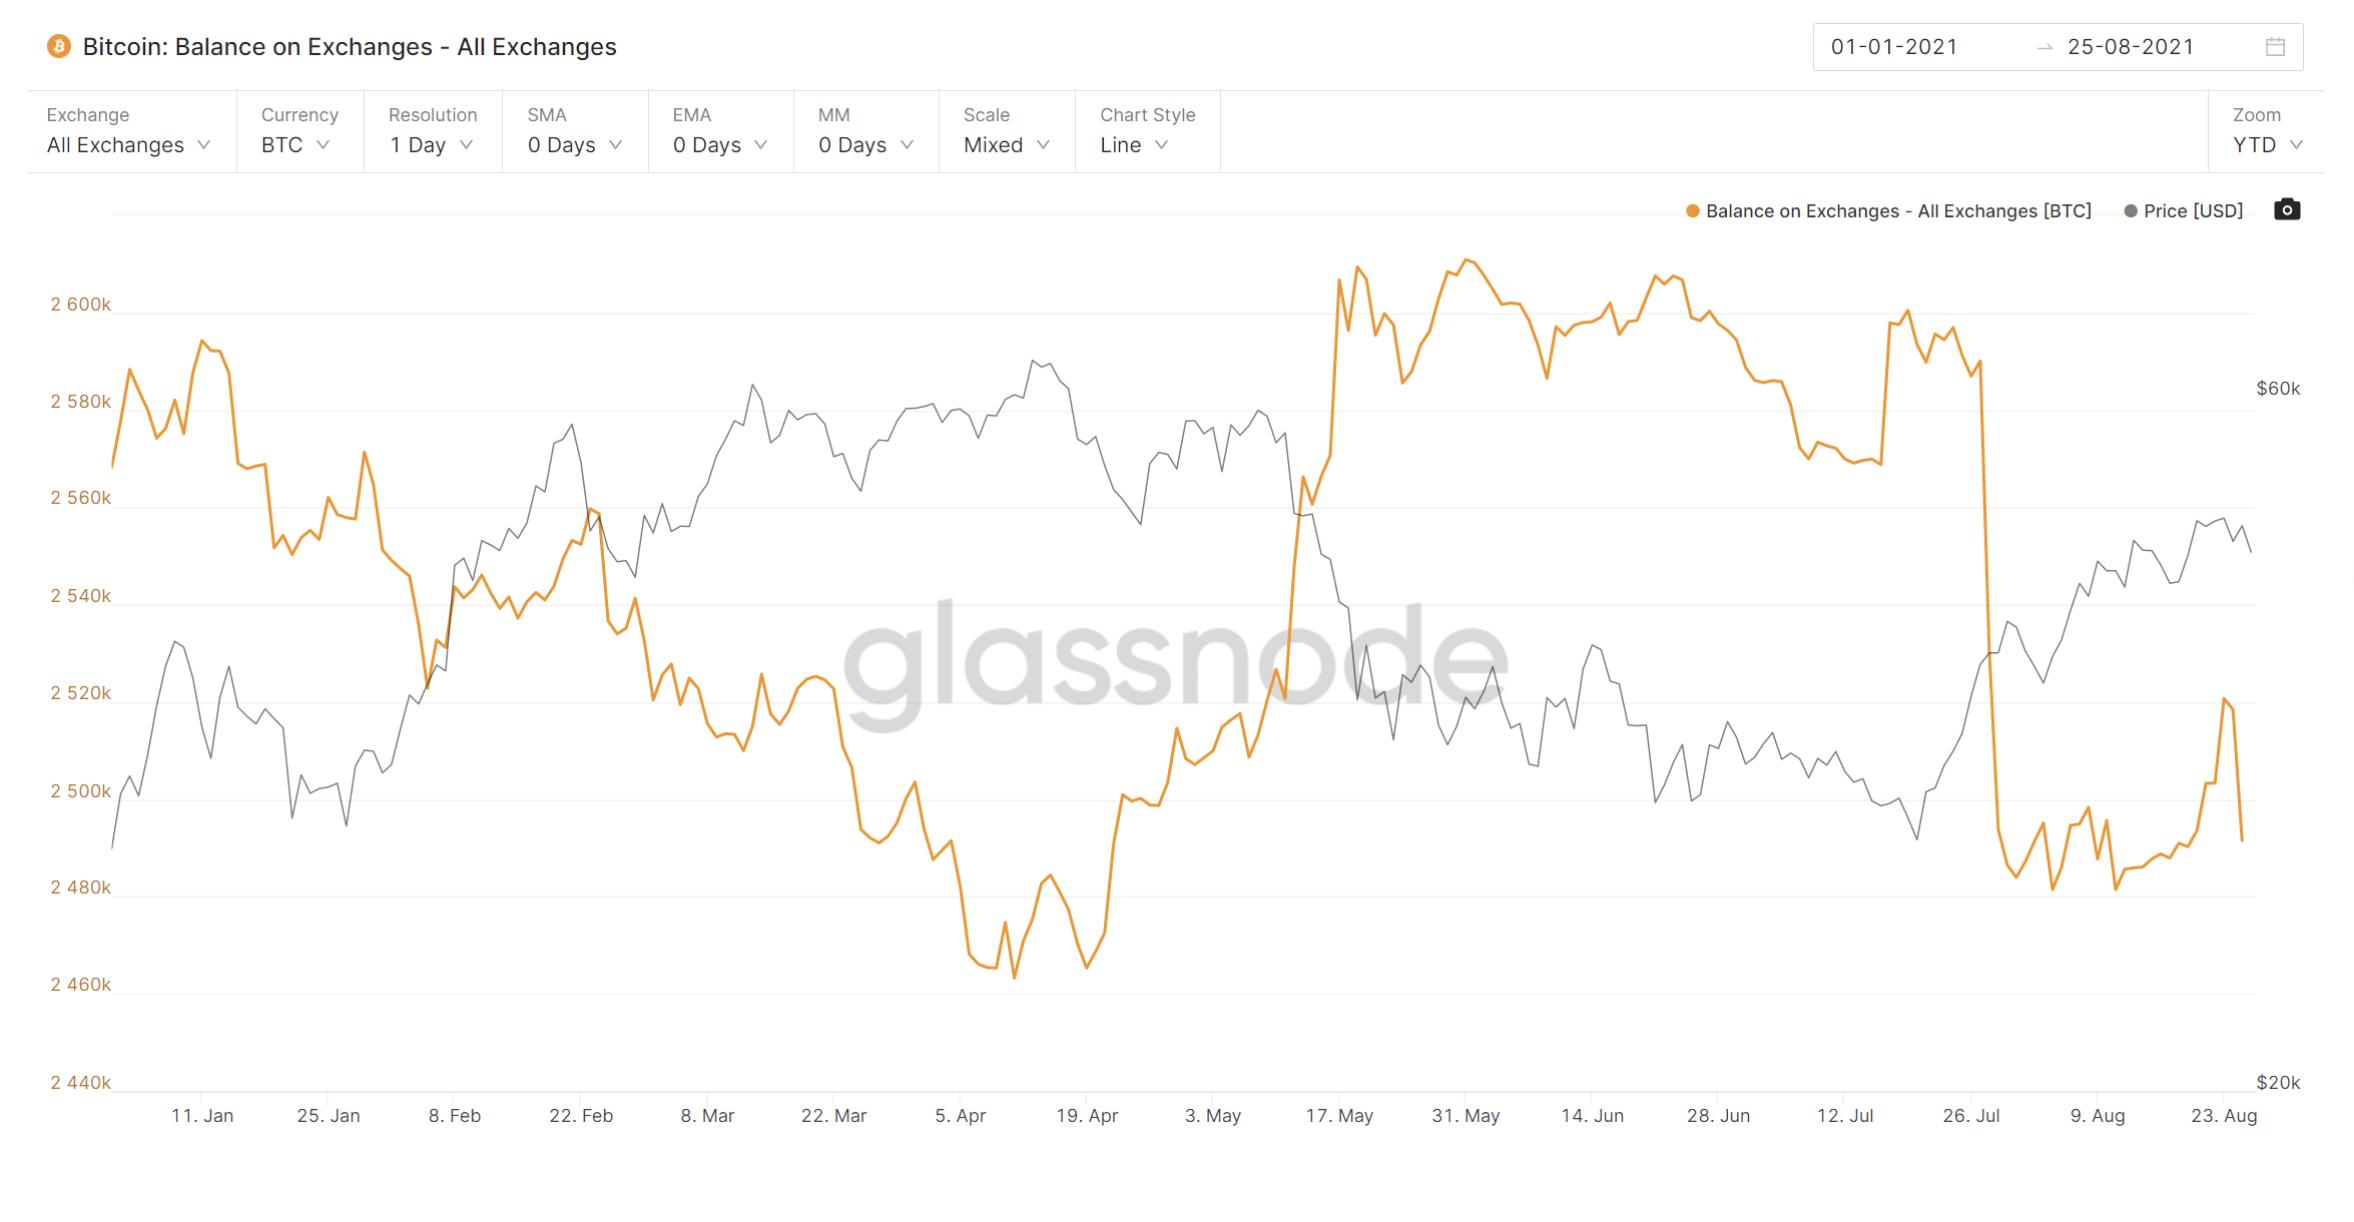 BTC All Exchanges